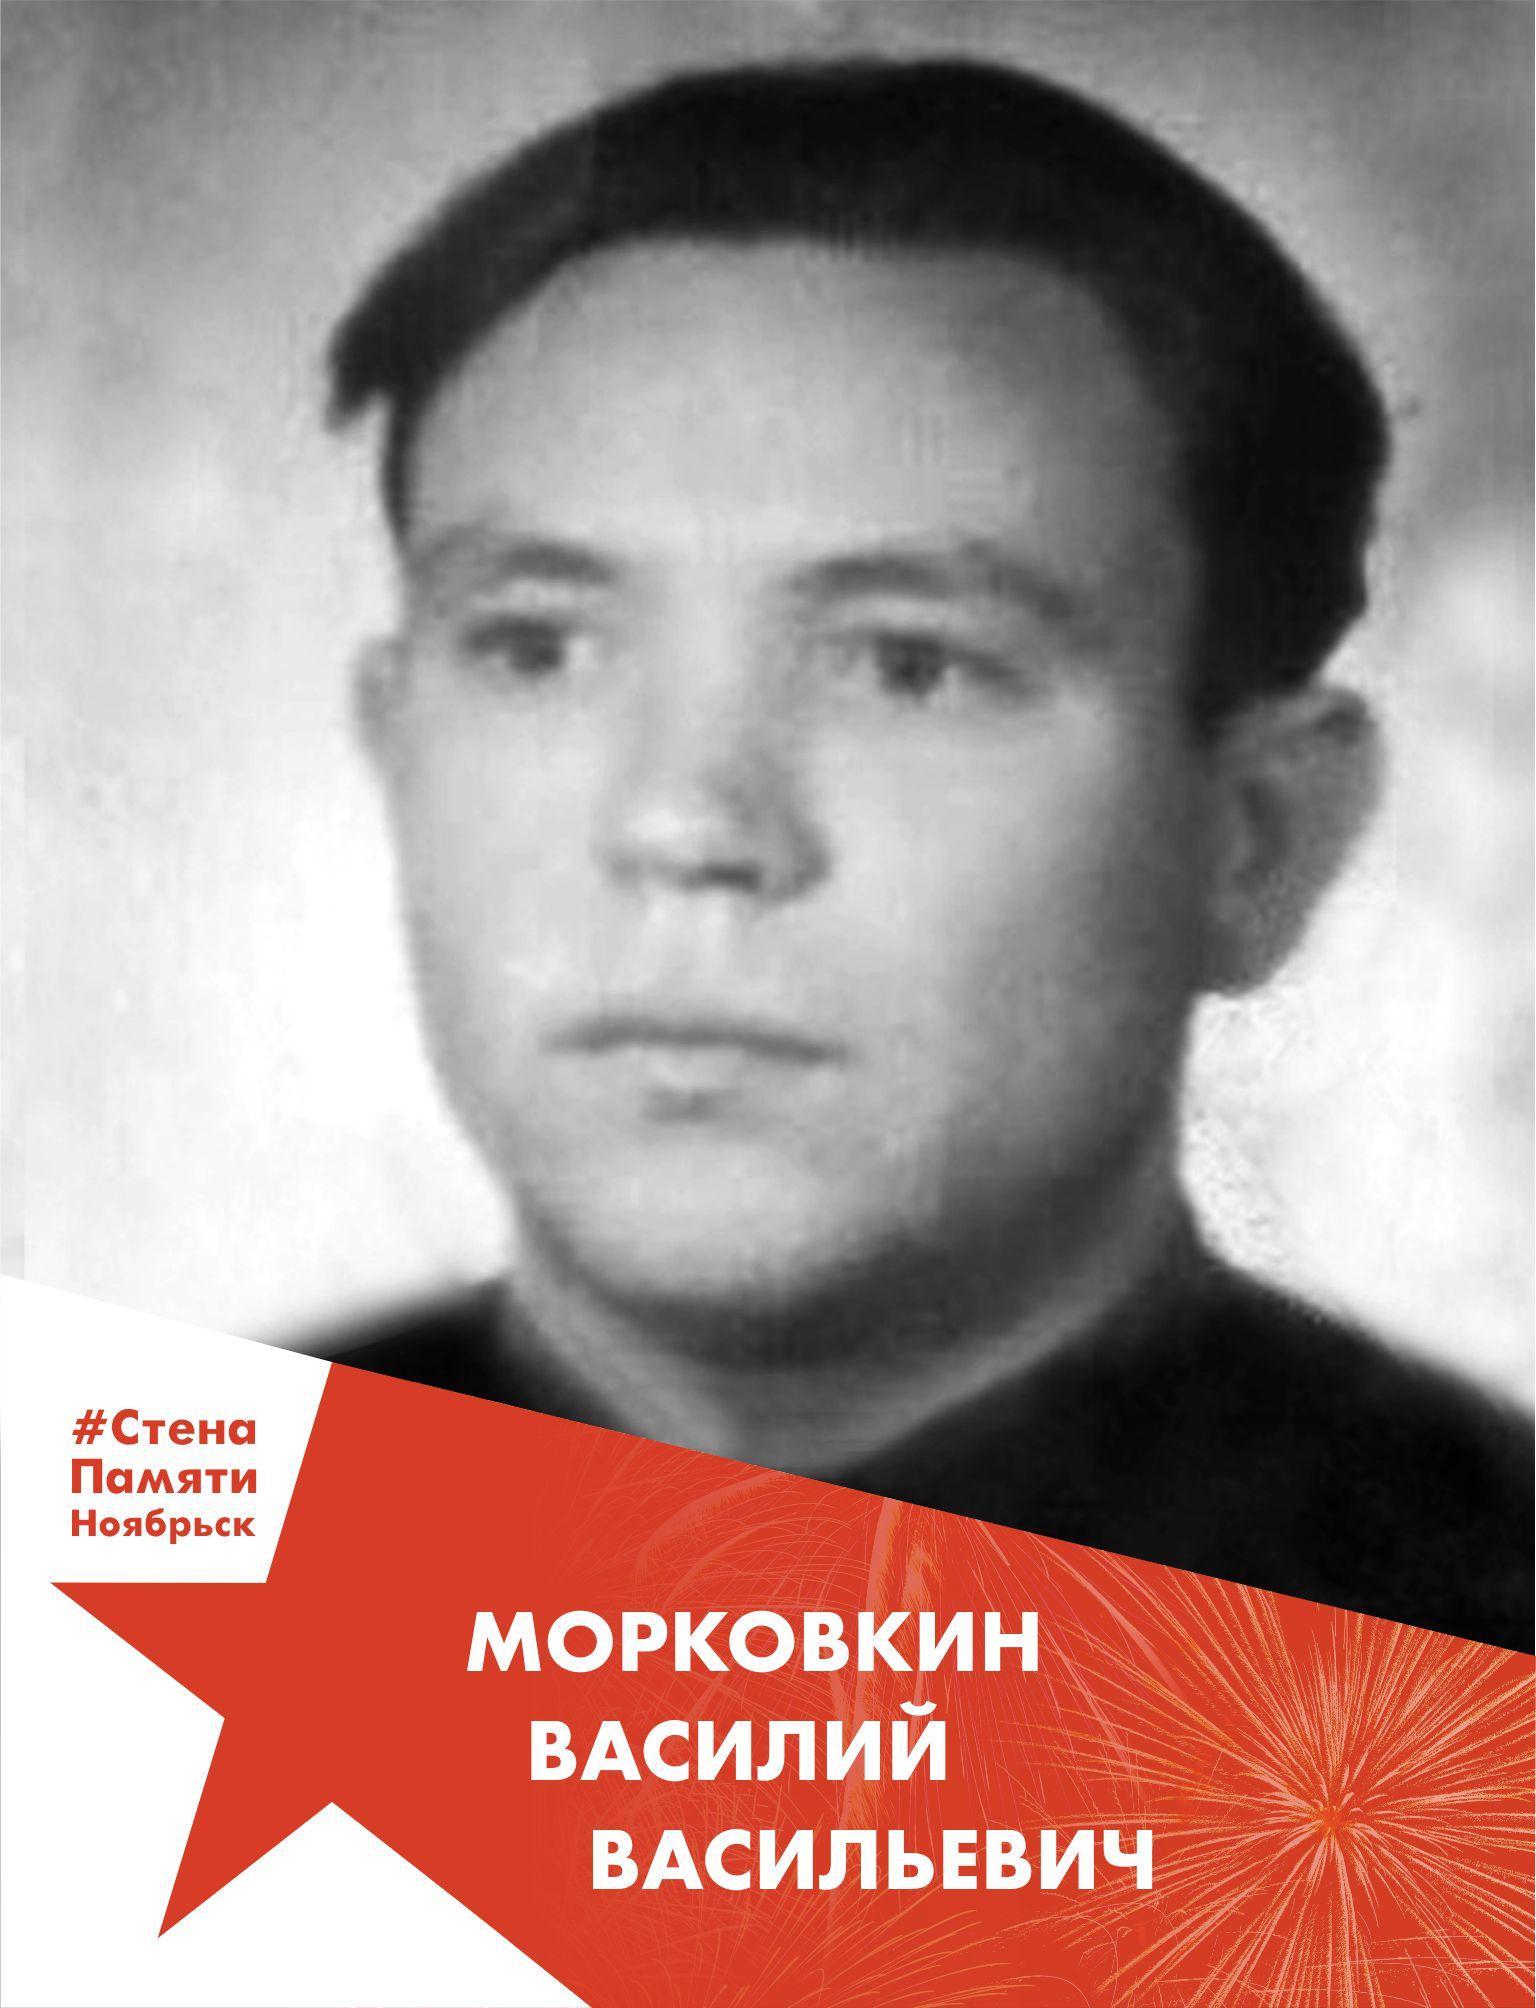 Морковкин Василий Васильевич